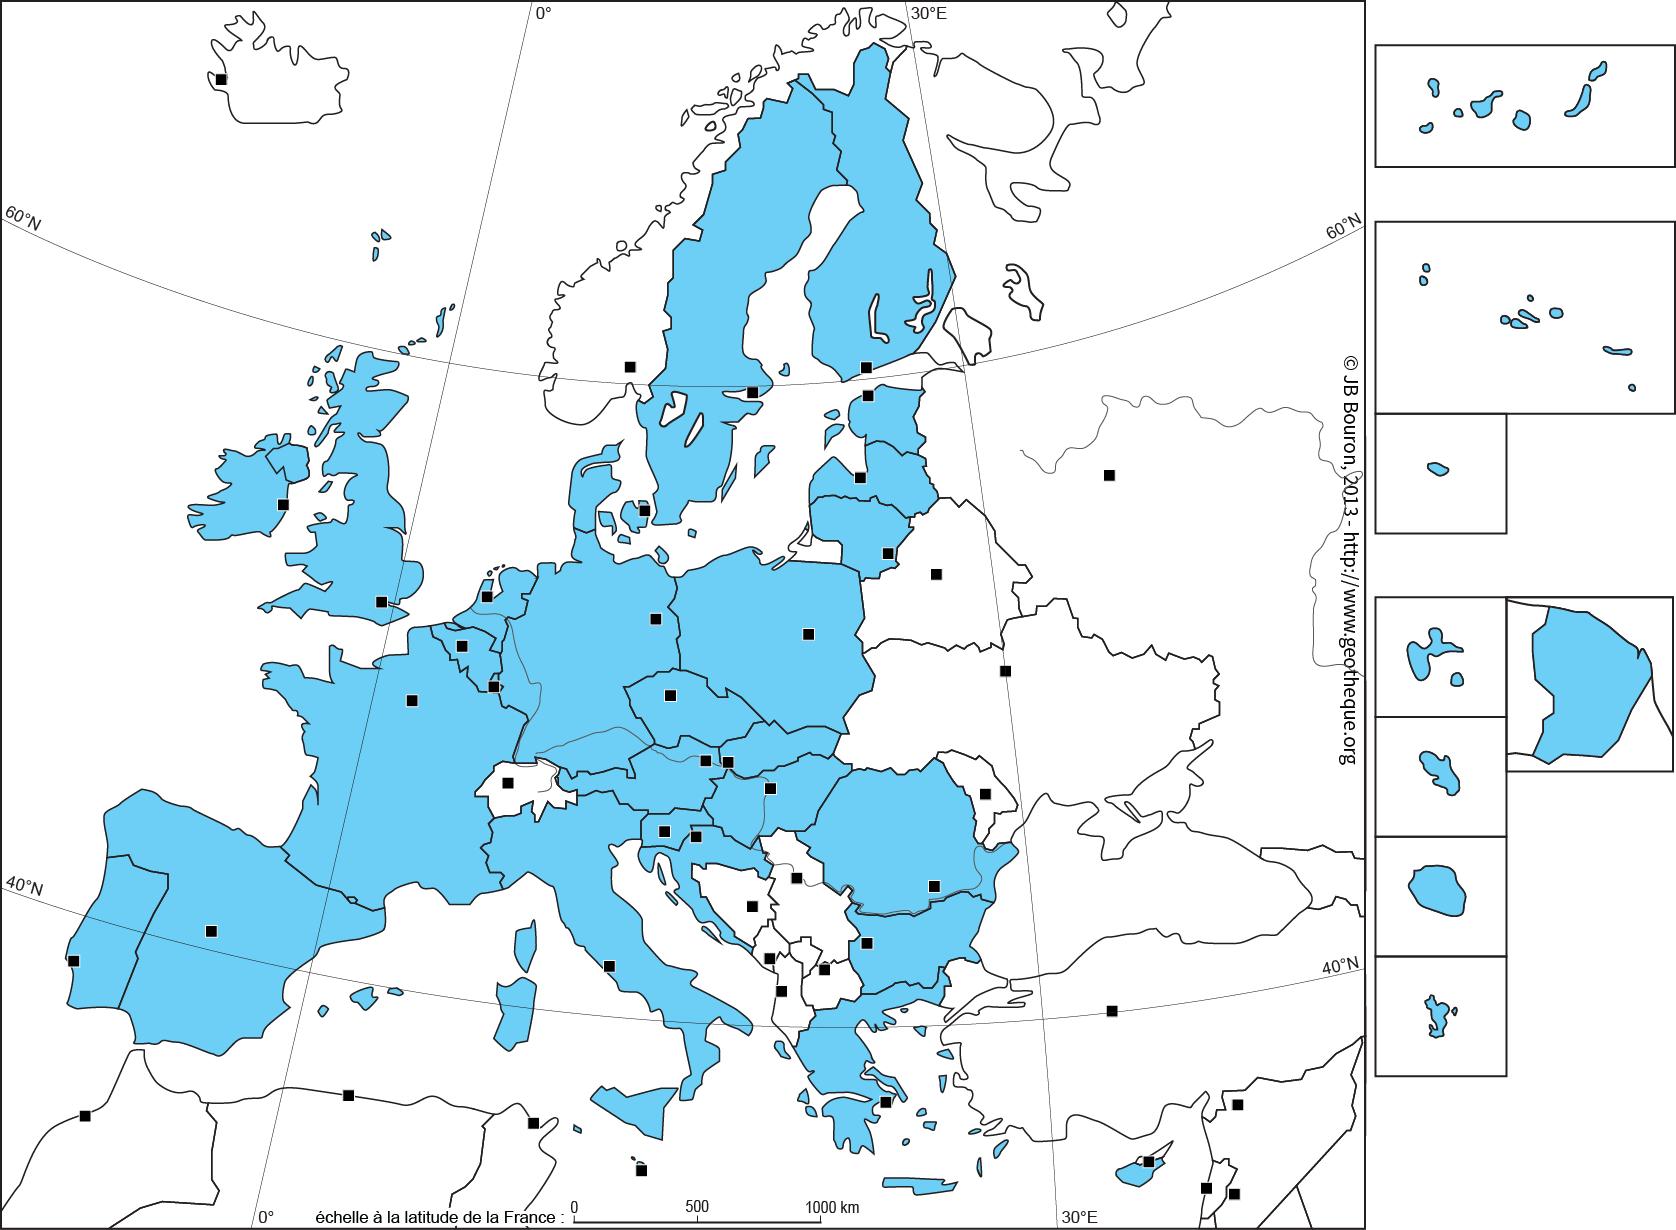 Fond De Carte De L'union Européenne À 28 - Ue28 - Eu28 Map à Carte Des Pays De L Union Européenne